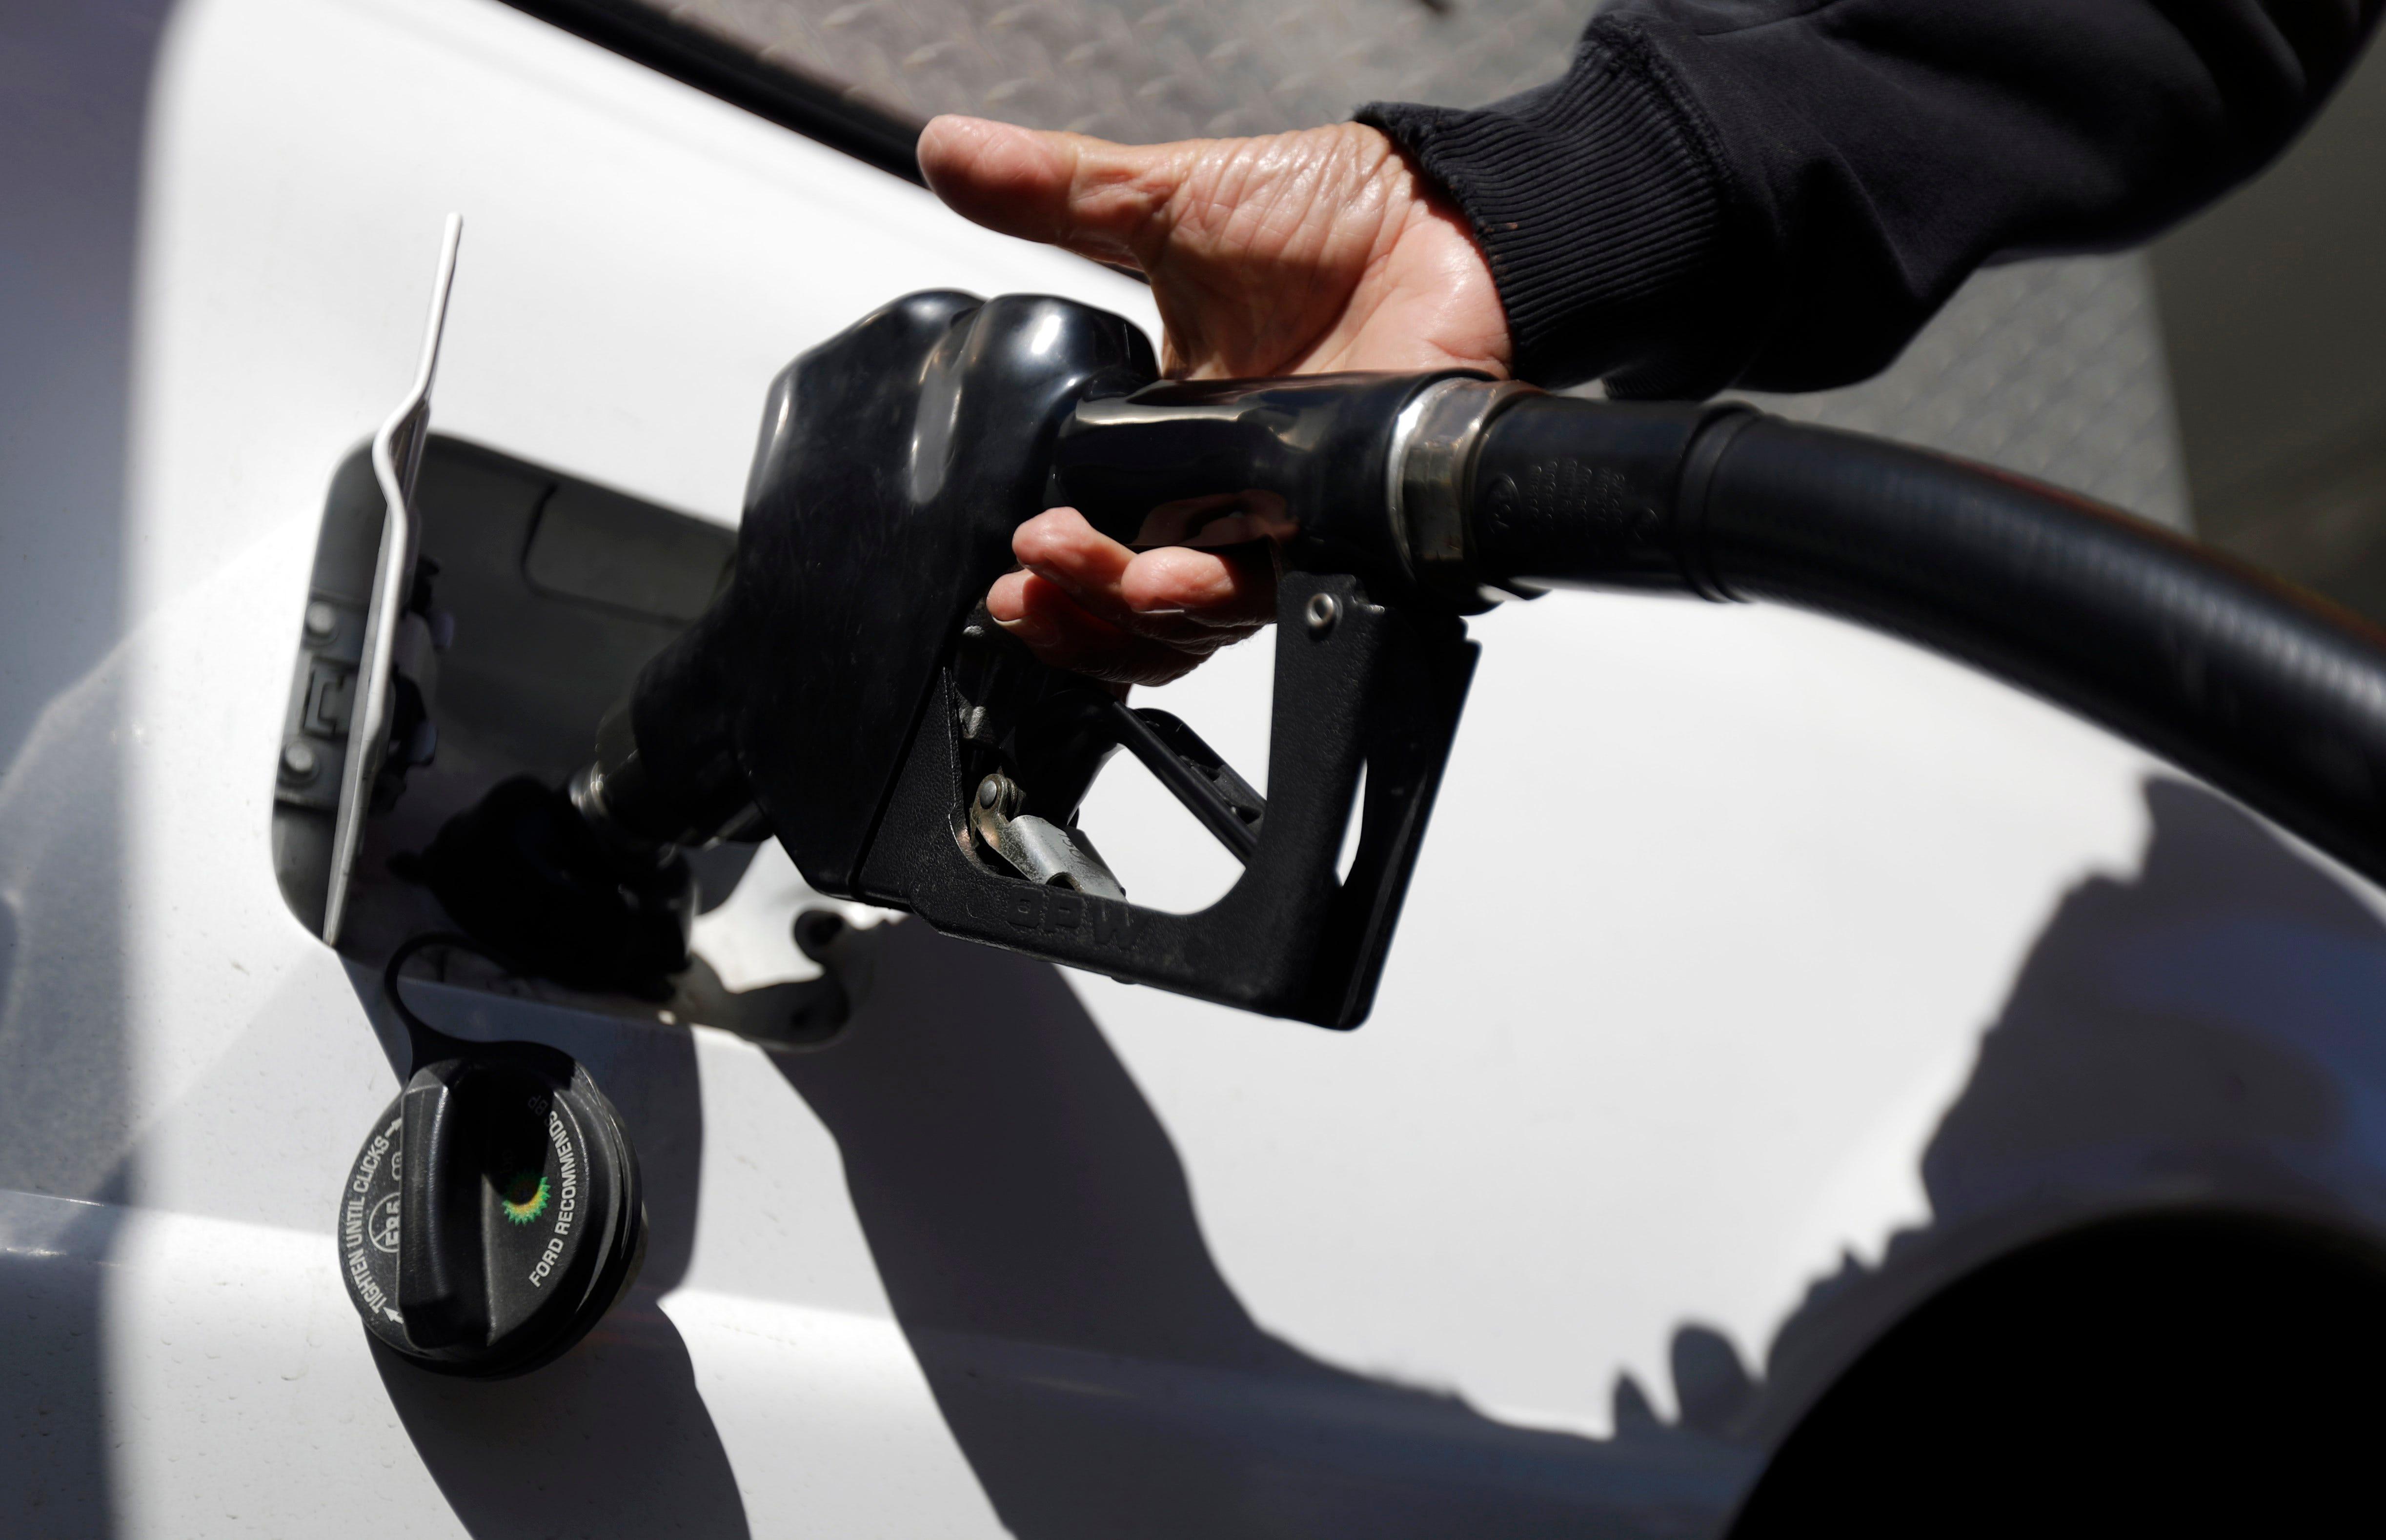 Avg. Gas Prices Fall 0.5 Cents Per Gallon In OKC